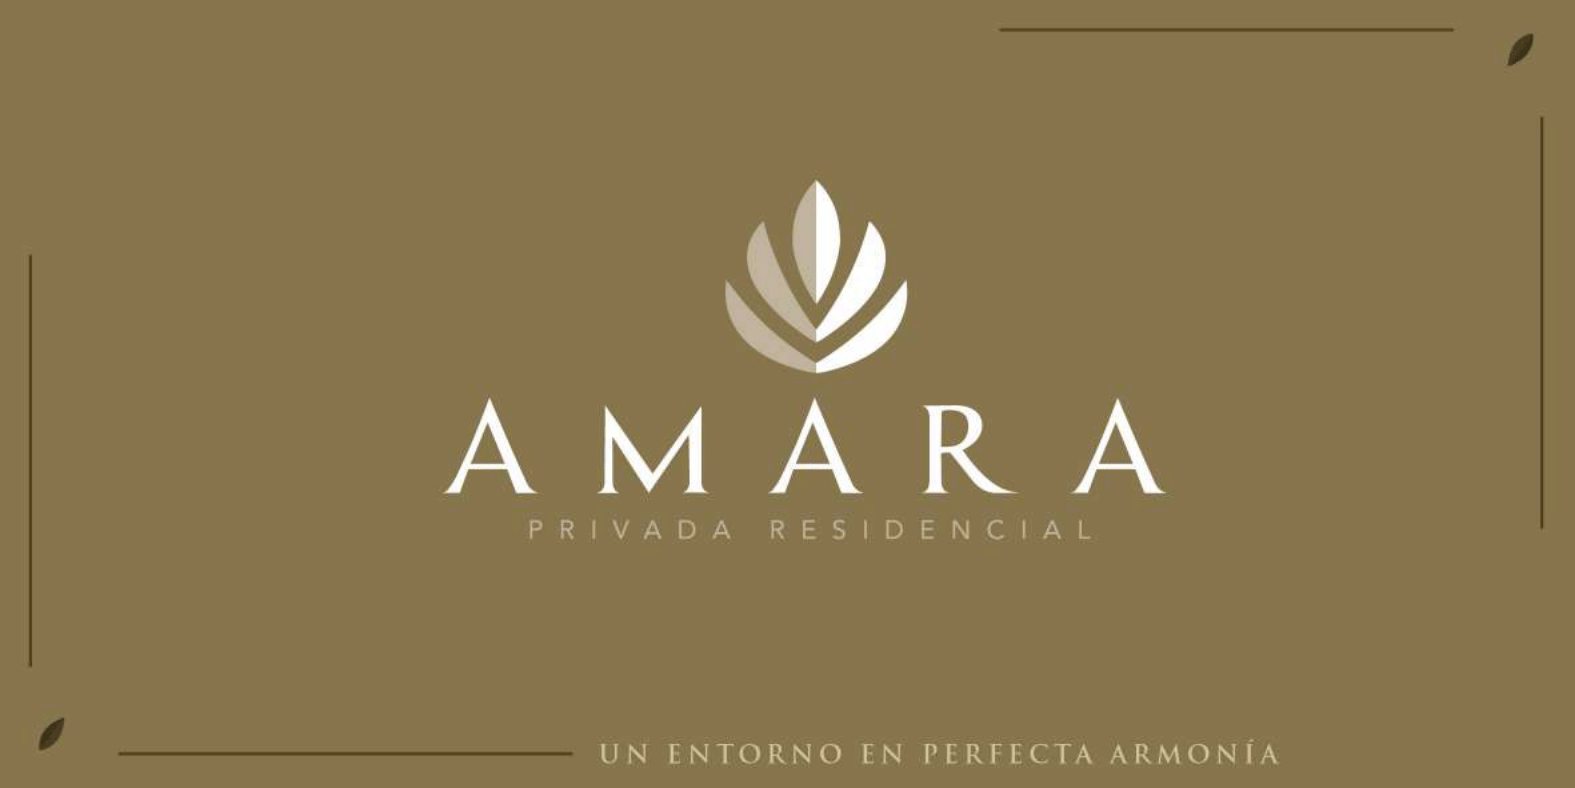 AMARA, PRIVADA RESIDENCIAL (MÉRIDA, NORTE)